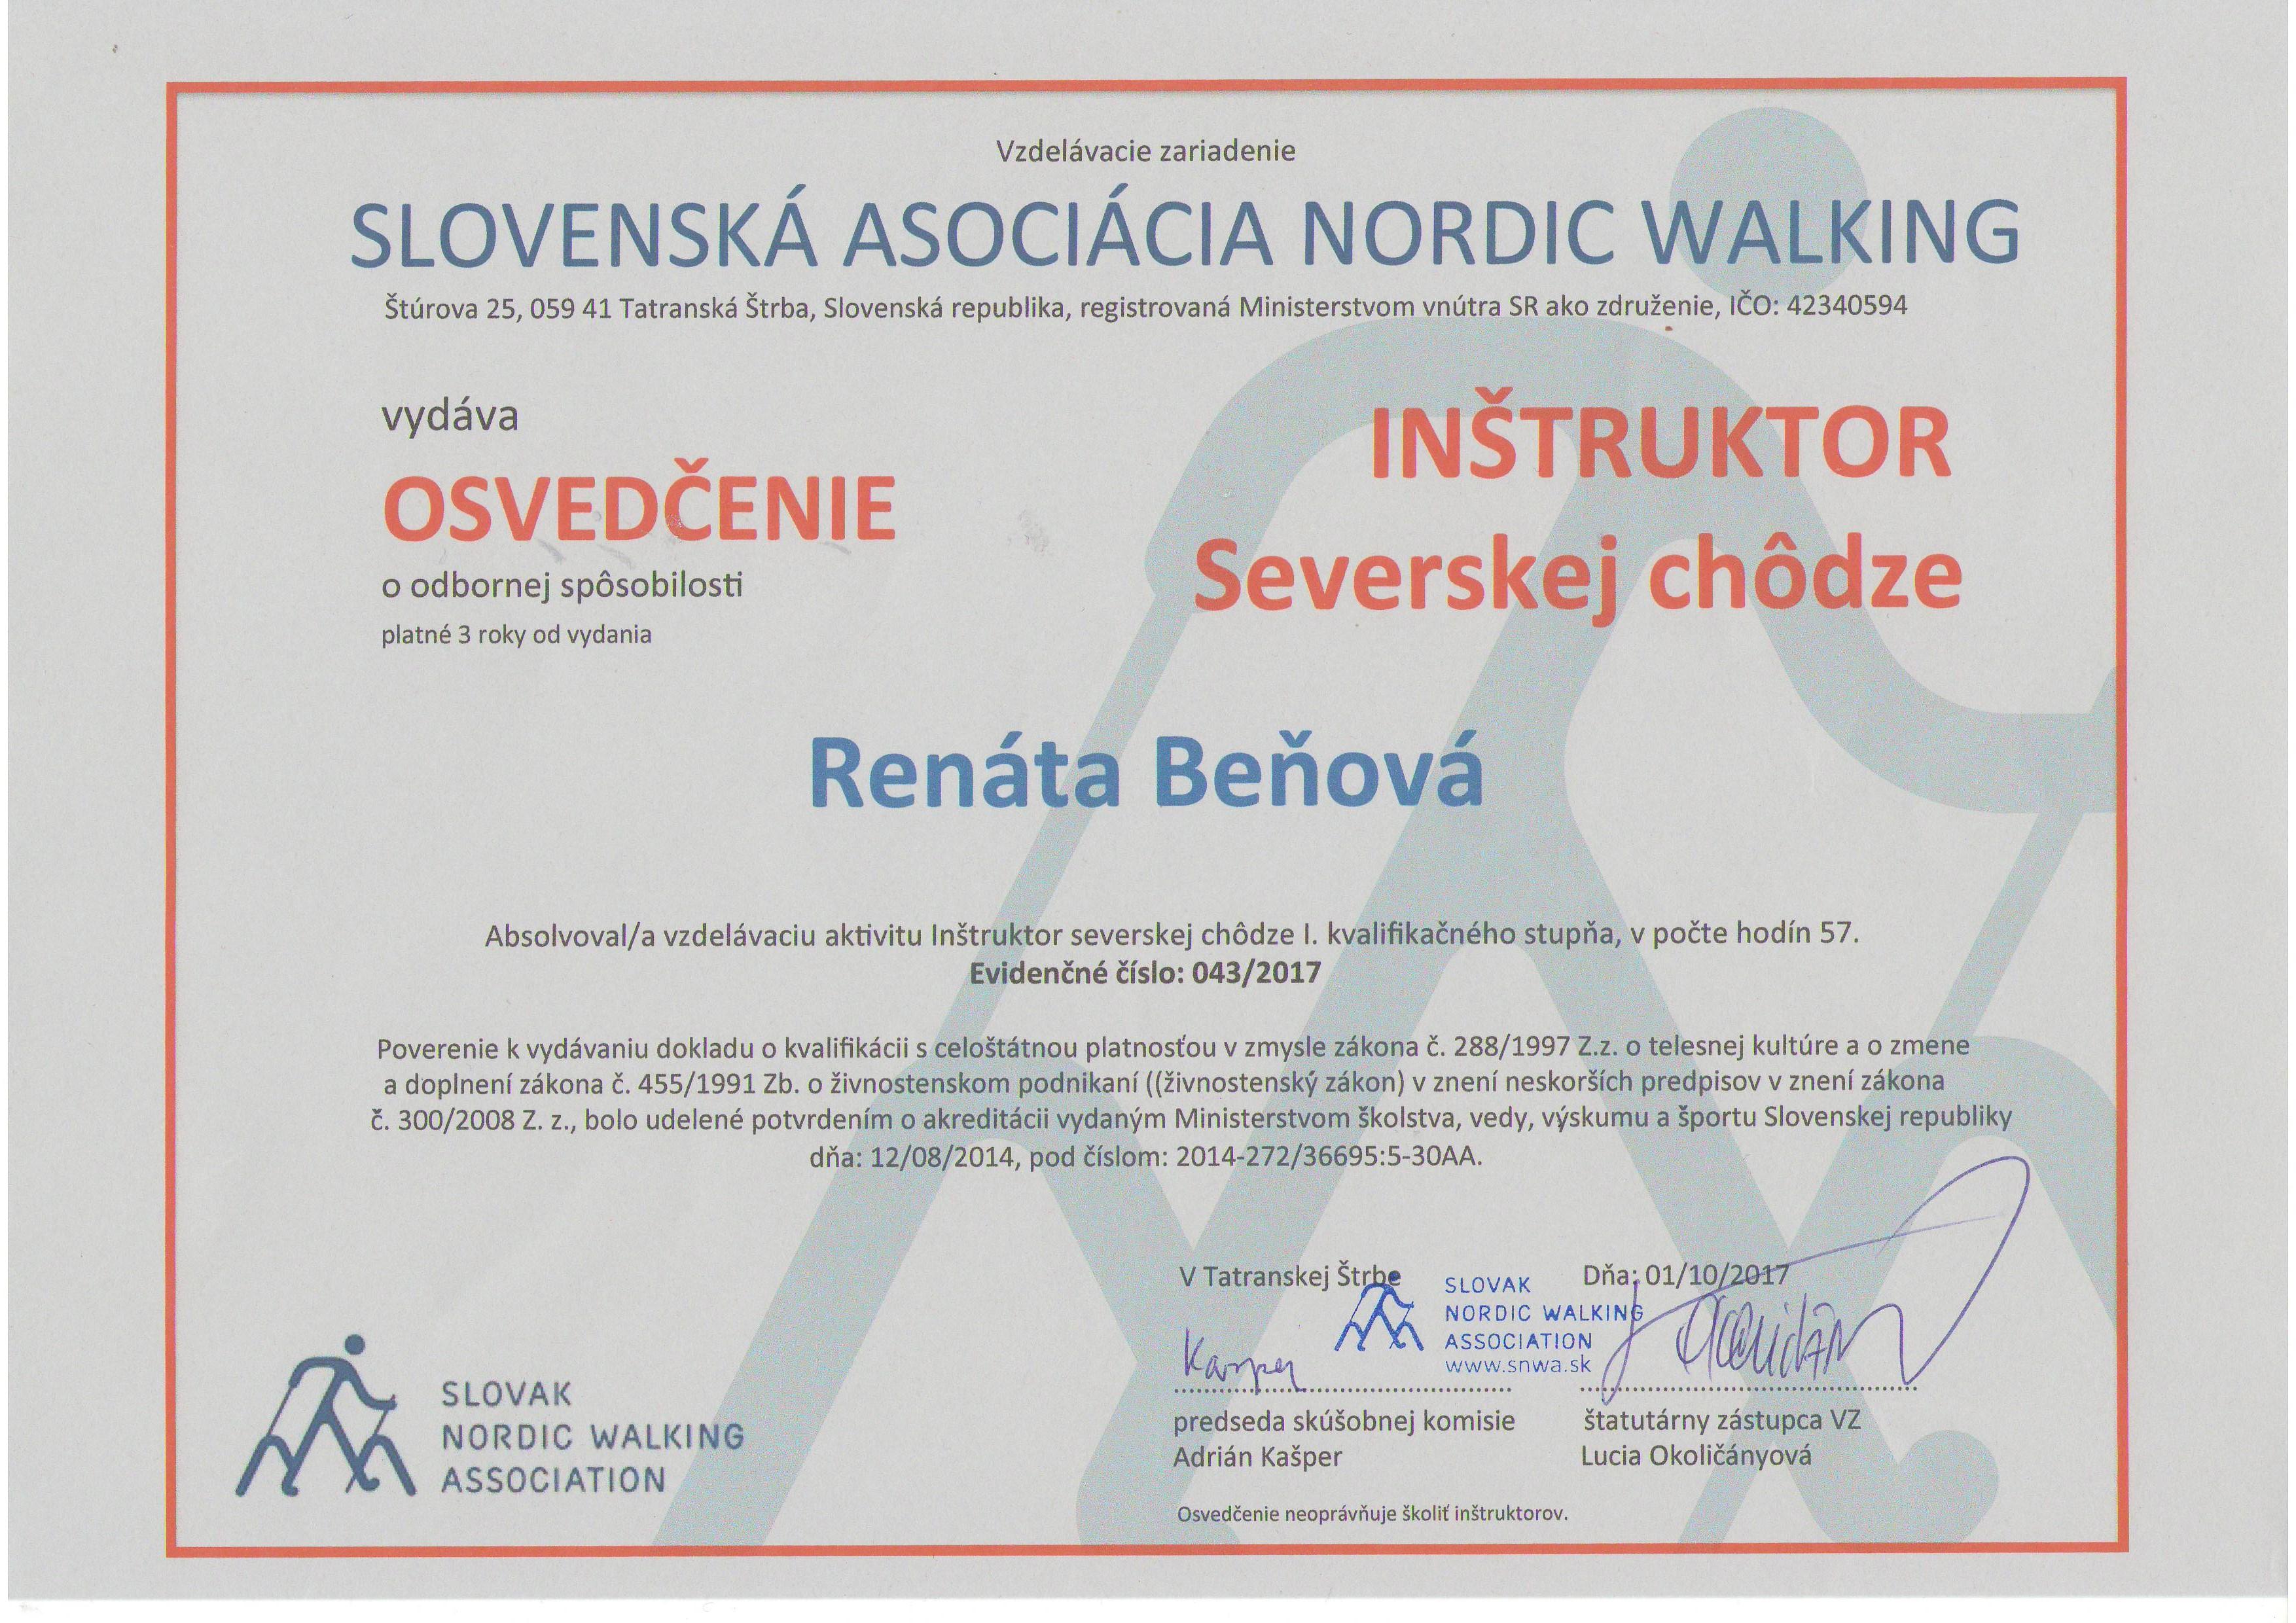 Inštruktor Severskej chôdze